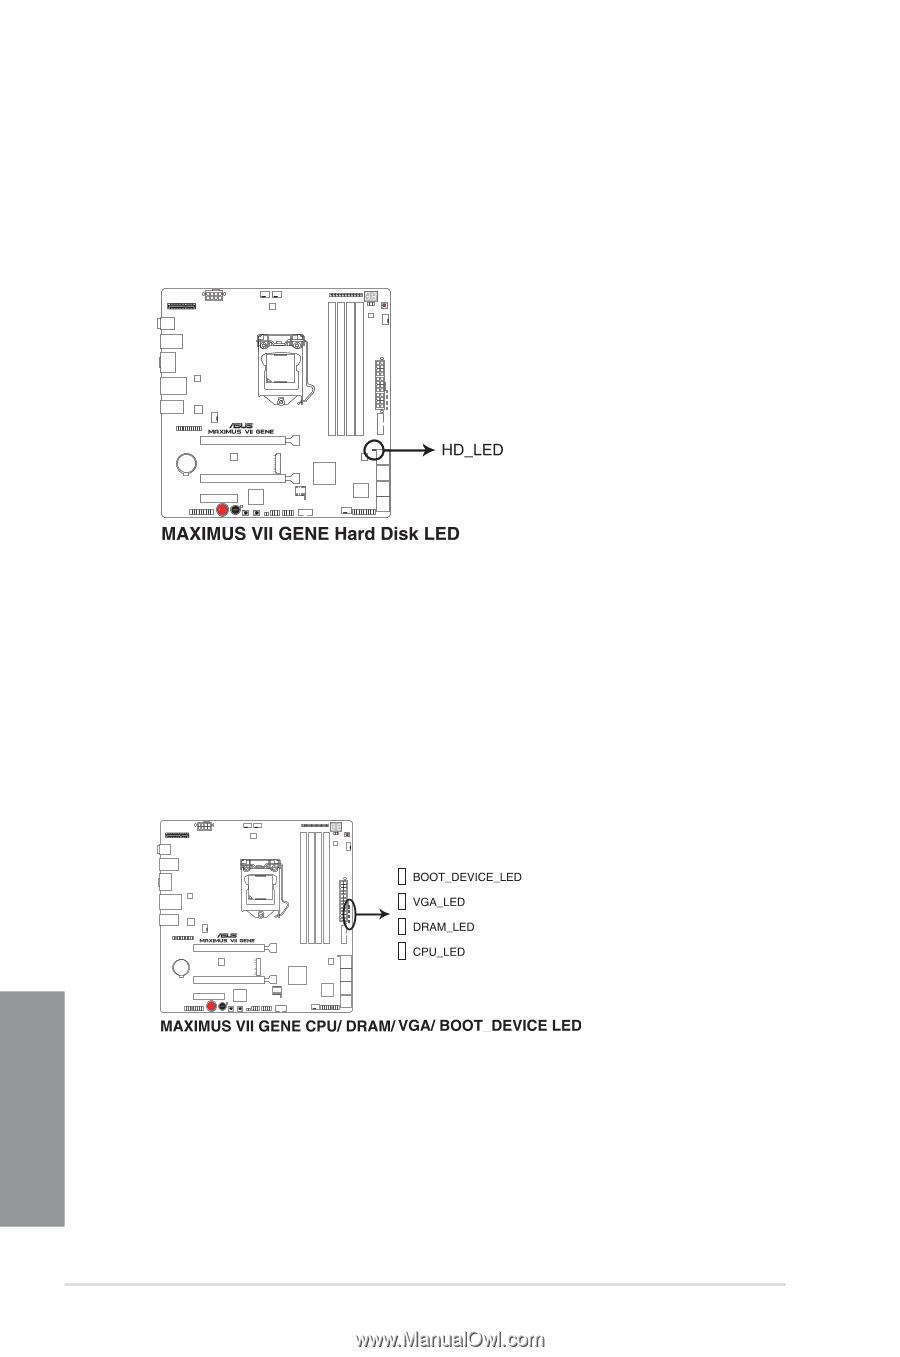 Asus MAXIMUS VII GENE   User Guide - Page 53